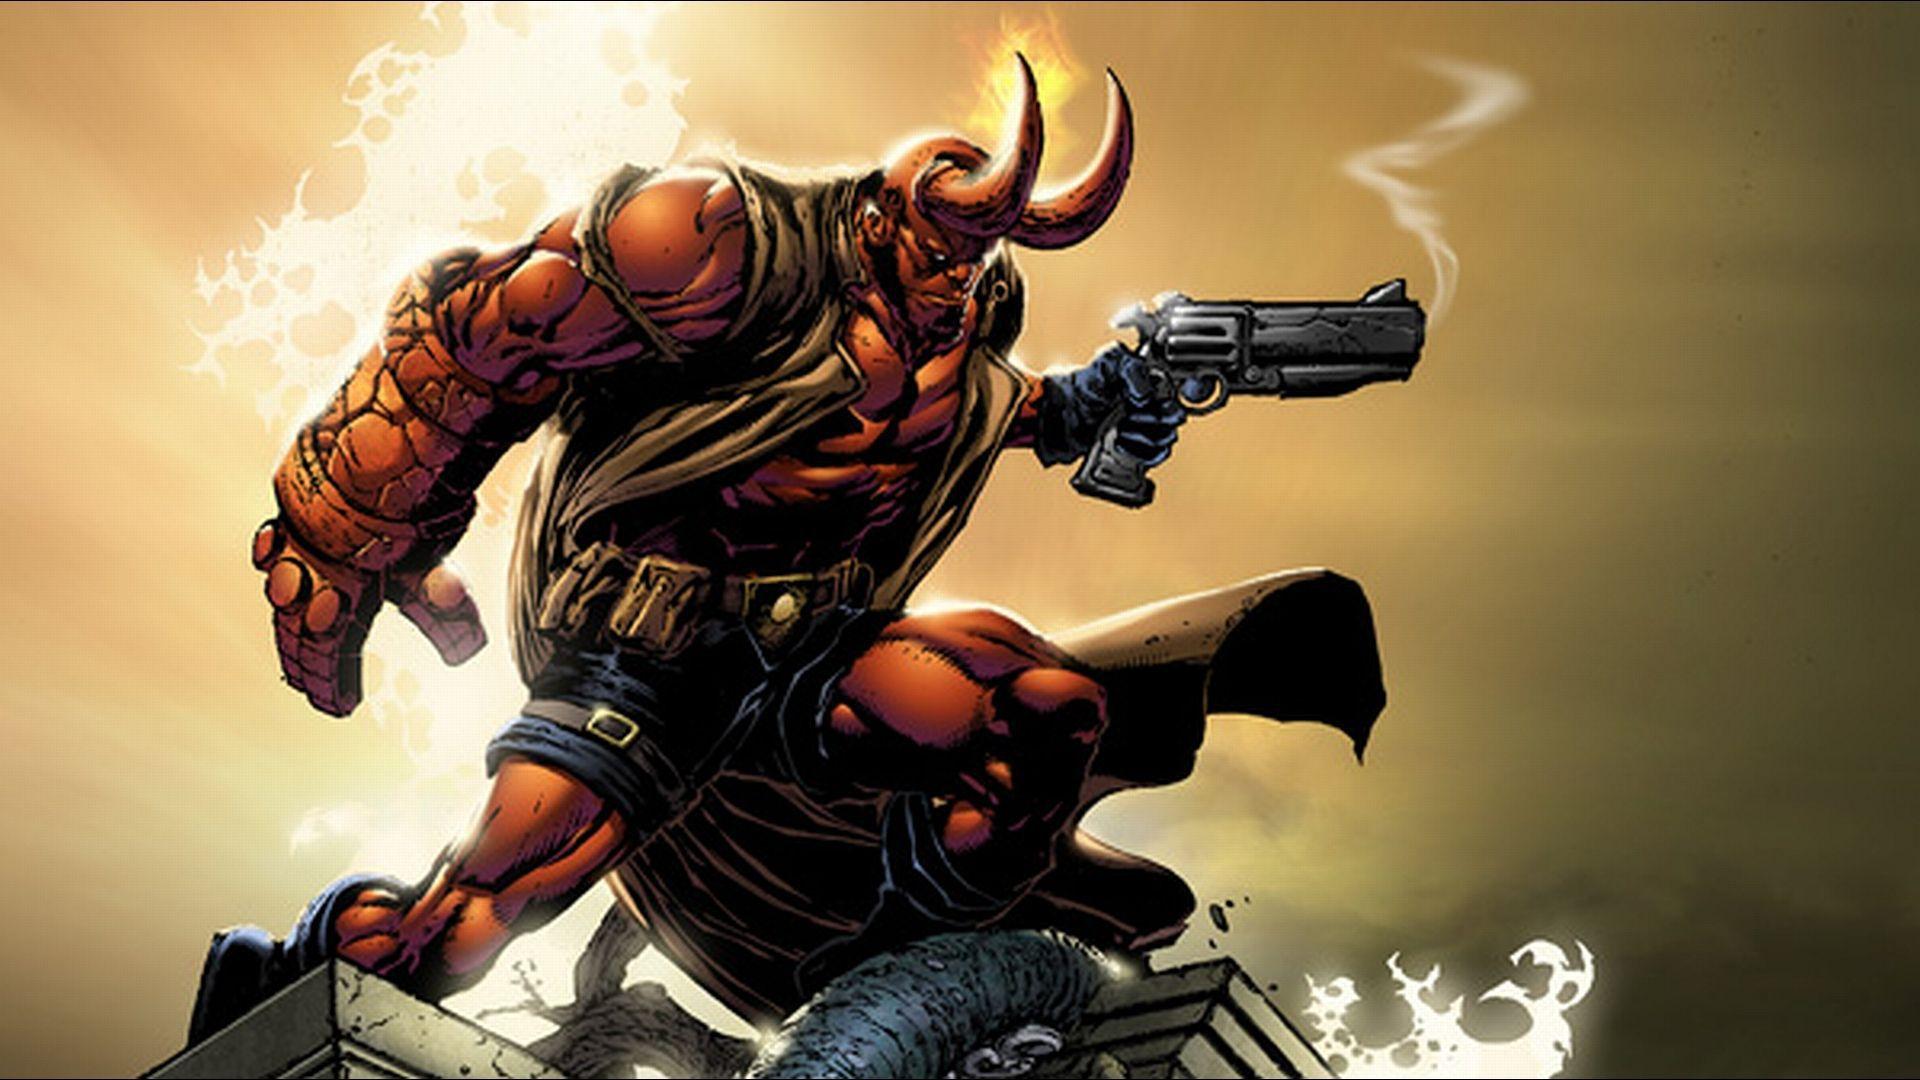 Hellboy Wallpapers